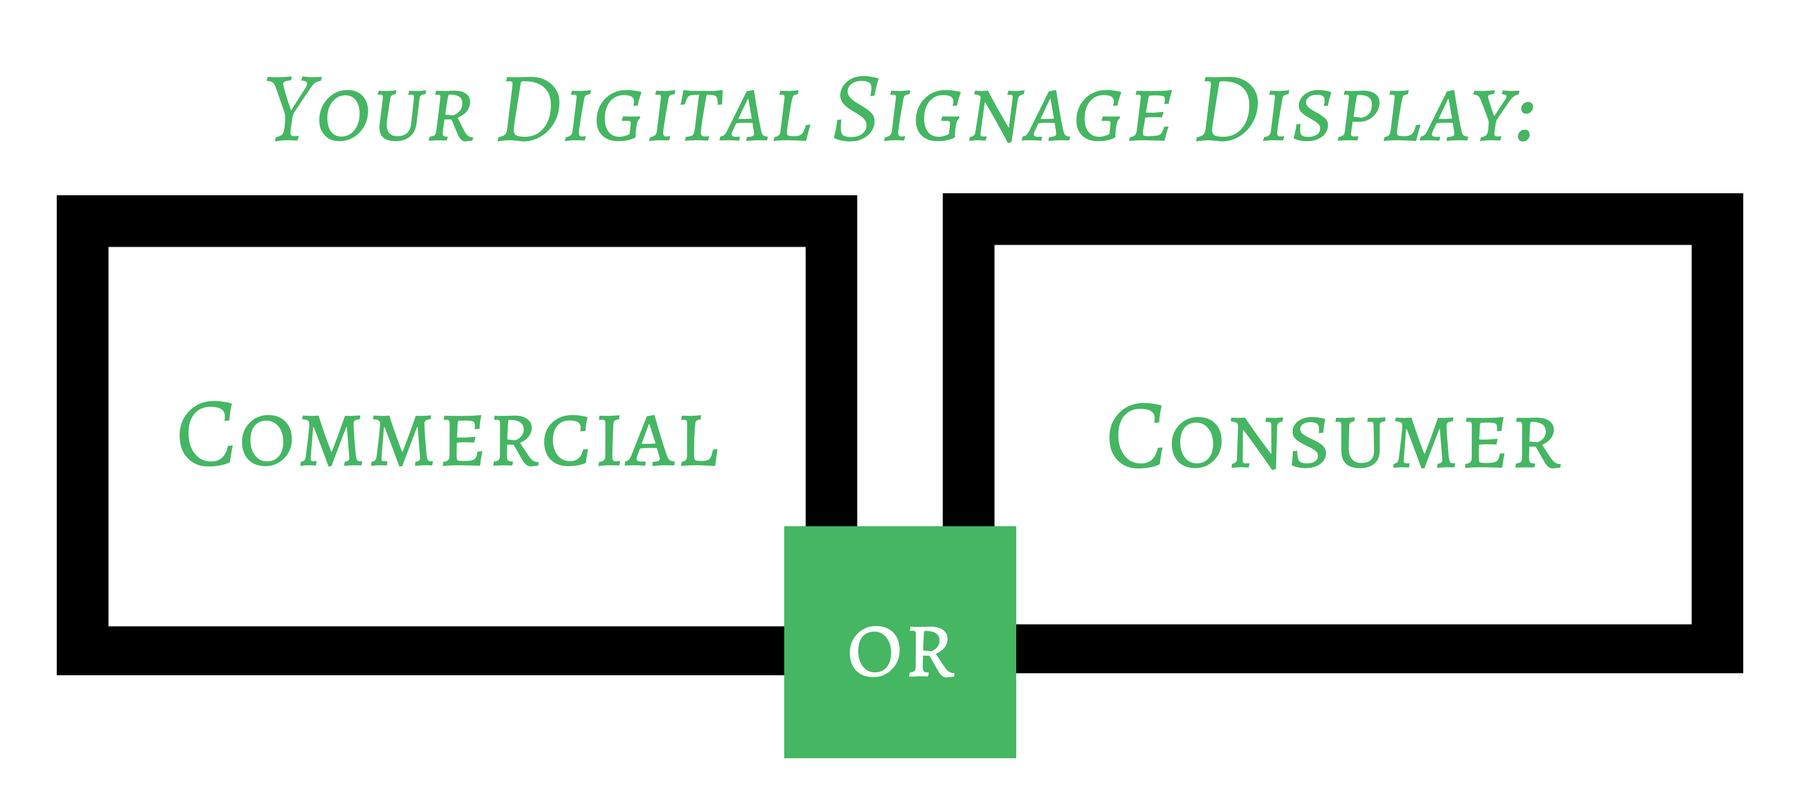 Your Digital Signage Display